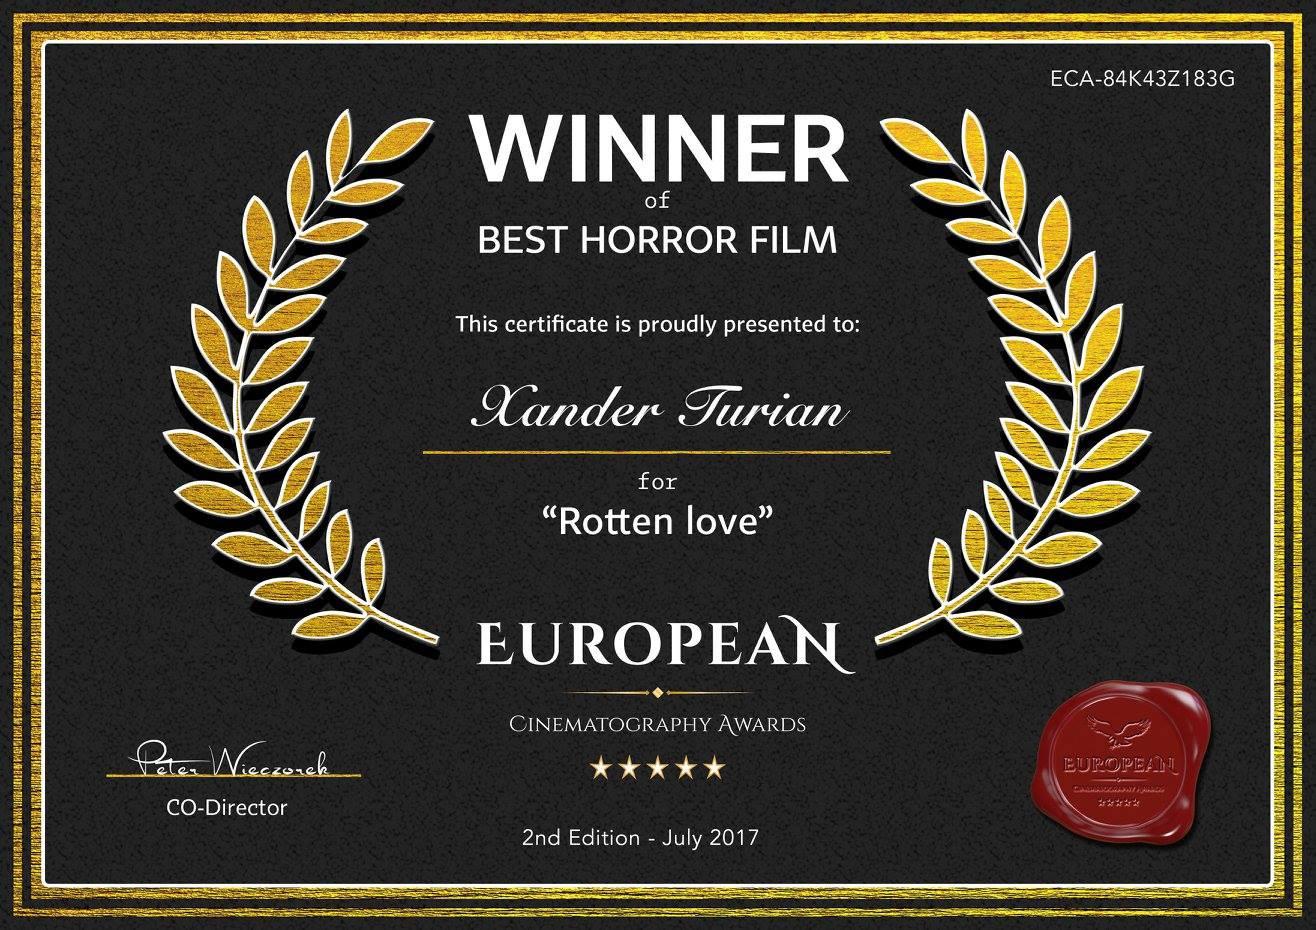 European Cinematography Awards